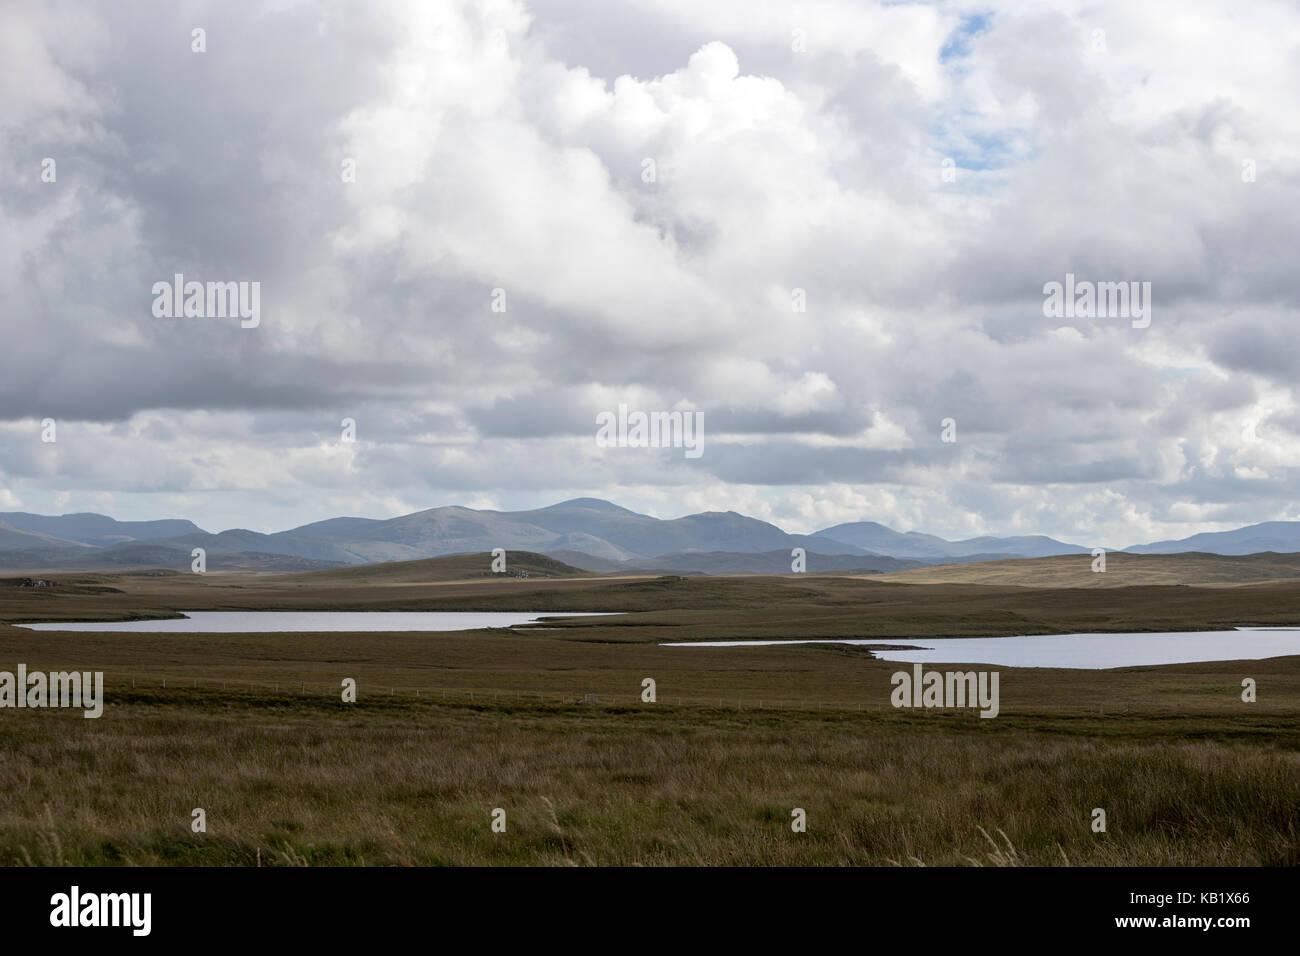 Landscape with lochs of Isle of Harris, Outer Hebrides, Scotland, UK - Stock Image